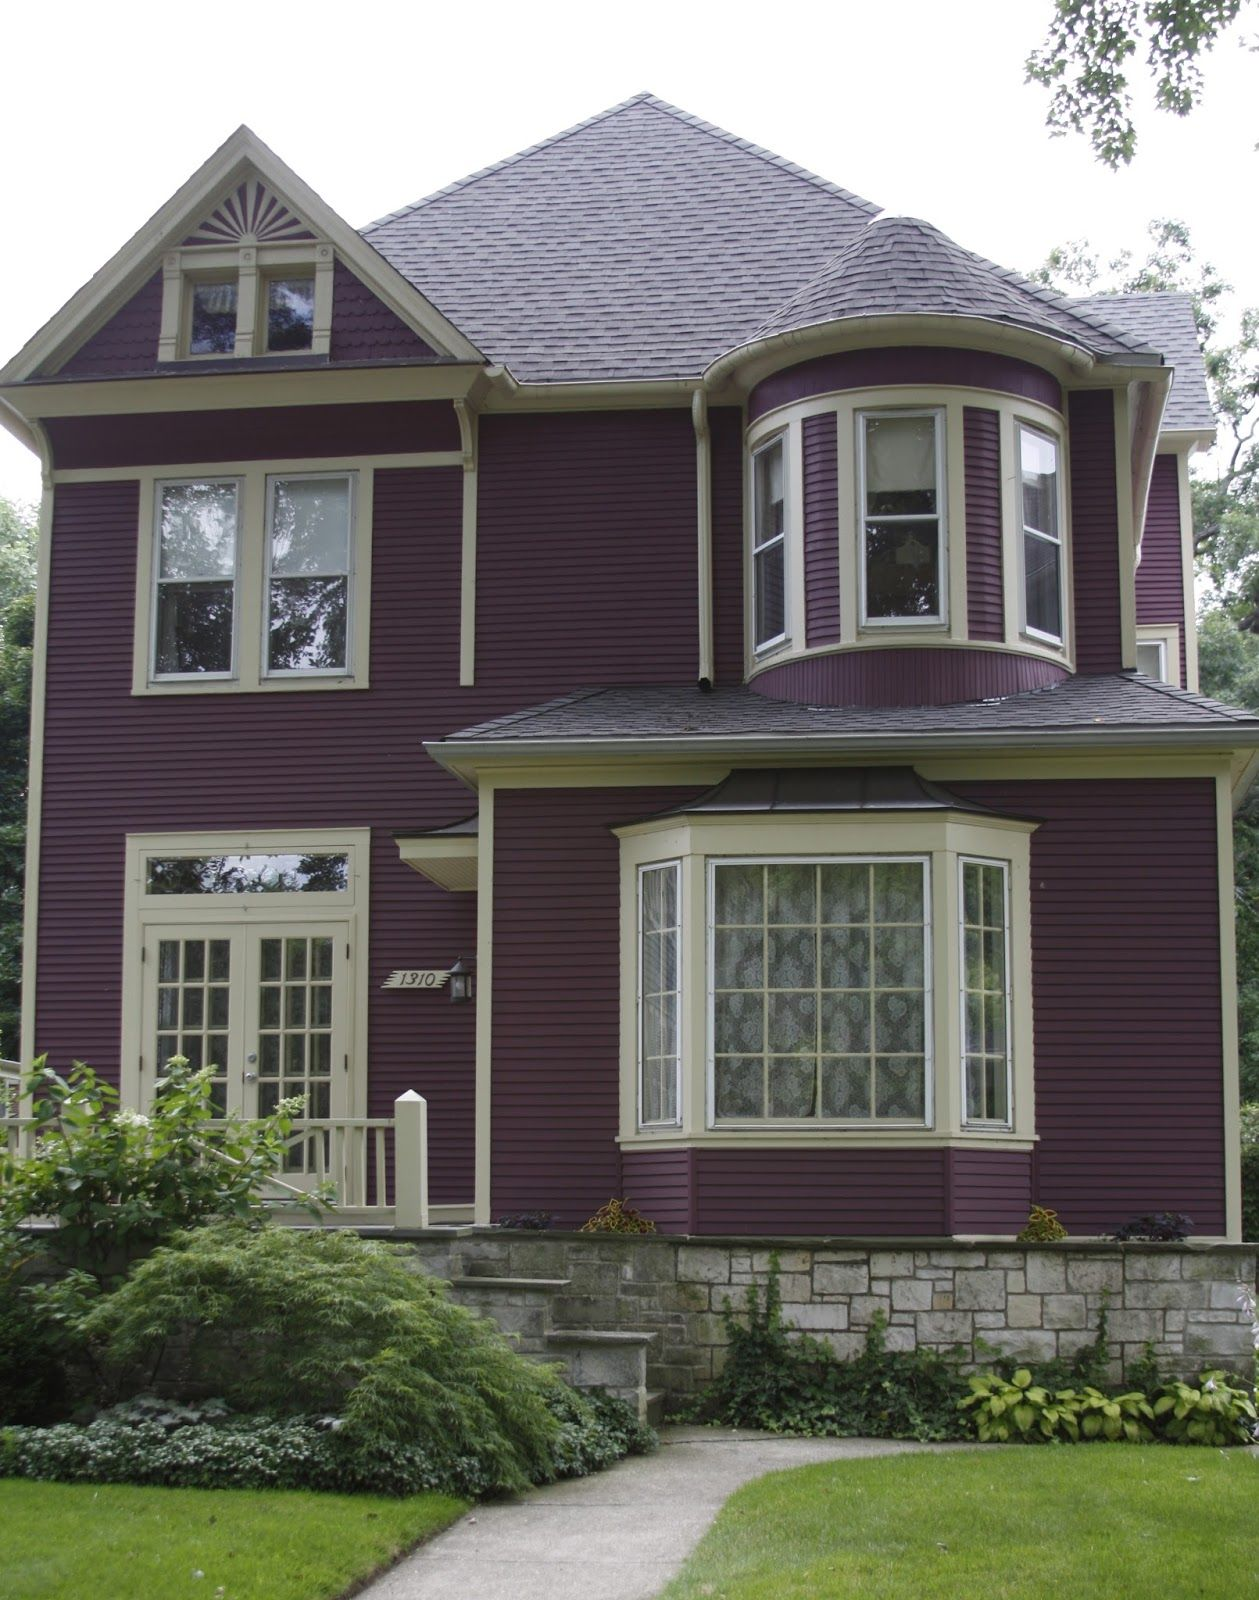 Stylish Purple Exterior Exterior Exteriordesign Exteriordesigncolor Purple Homedesign House Paint Exterior Beautiful Houses Exterior Outside House Paint